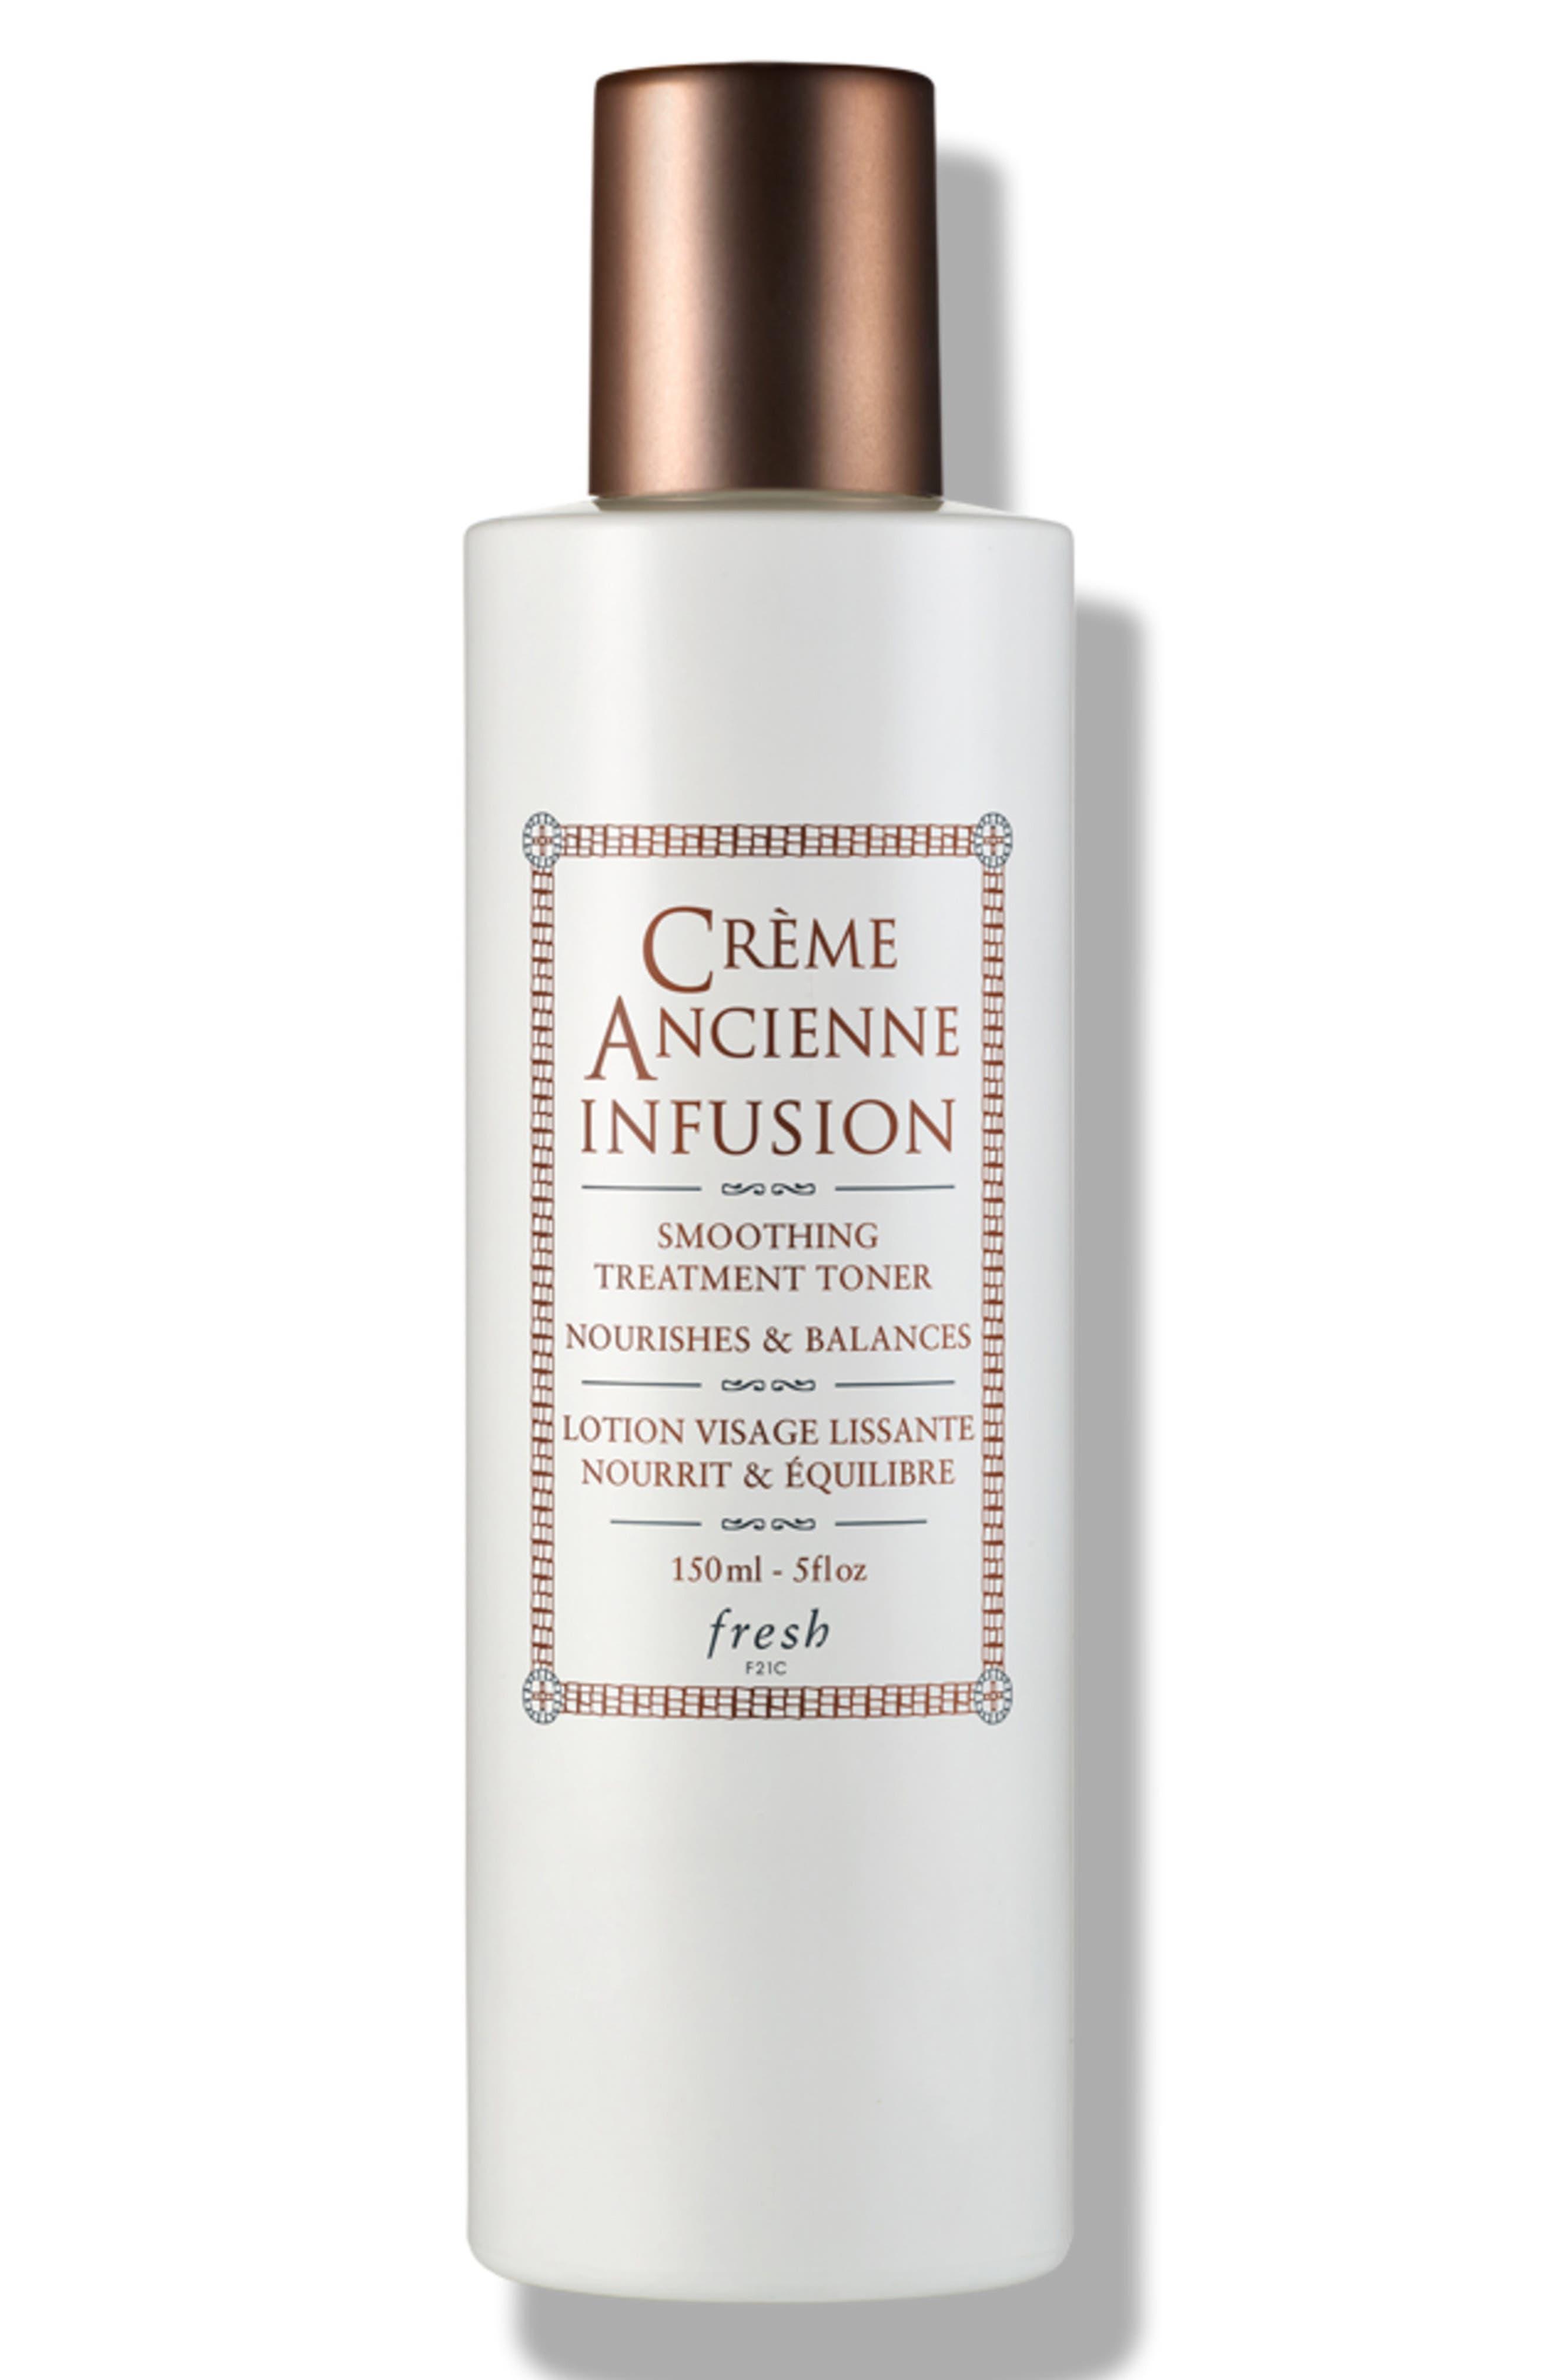 Fresh Creme Ancienne Infusion Smoothing Treatment Toner